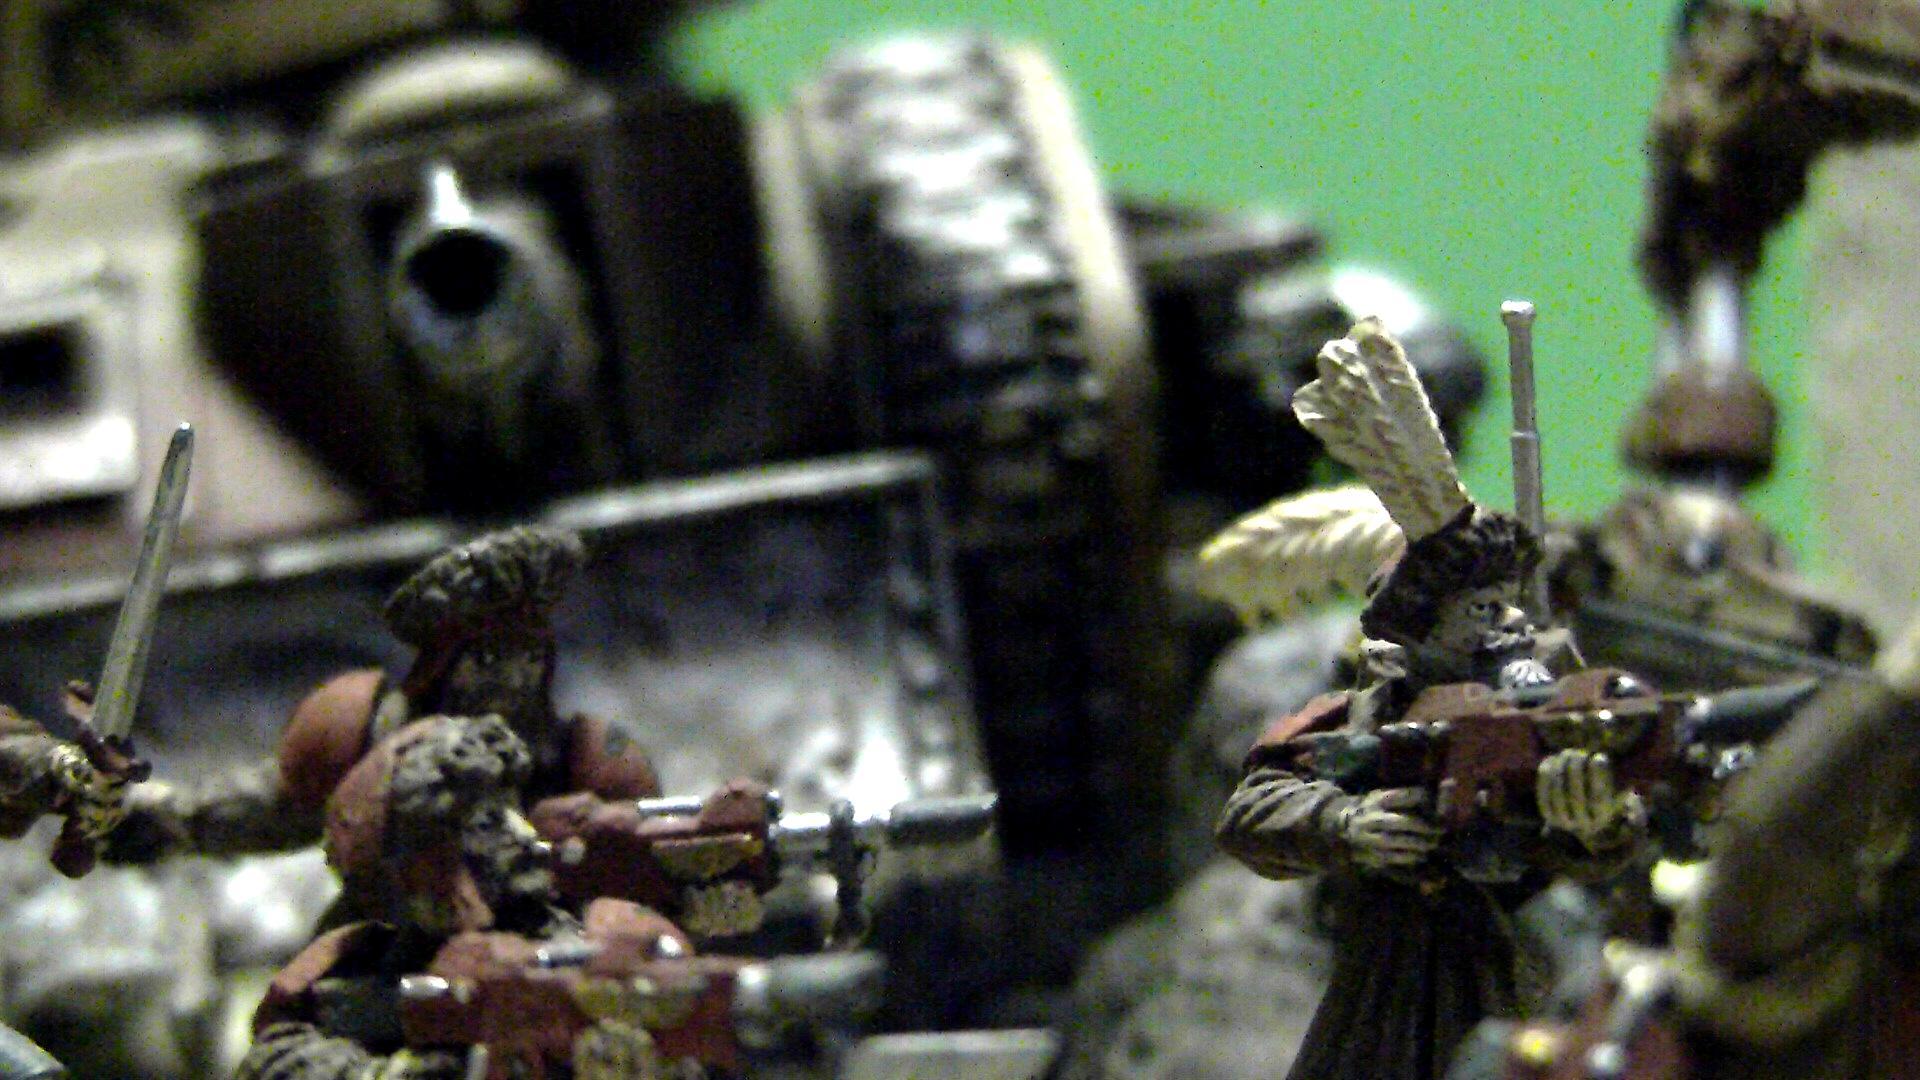 Conversion, Empire, Imperial Guard, Steam Punk, Warhammer Fantasy